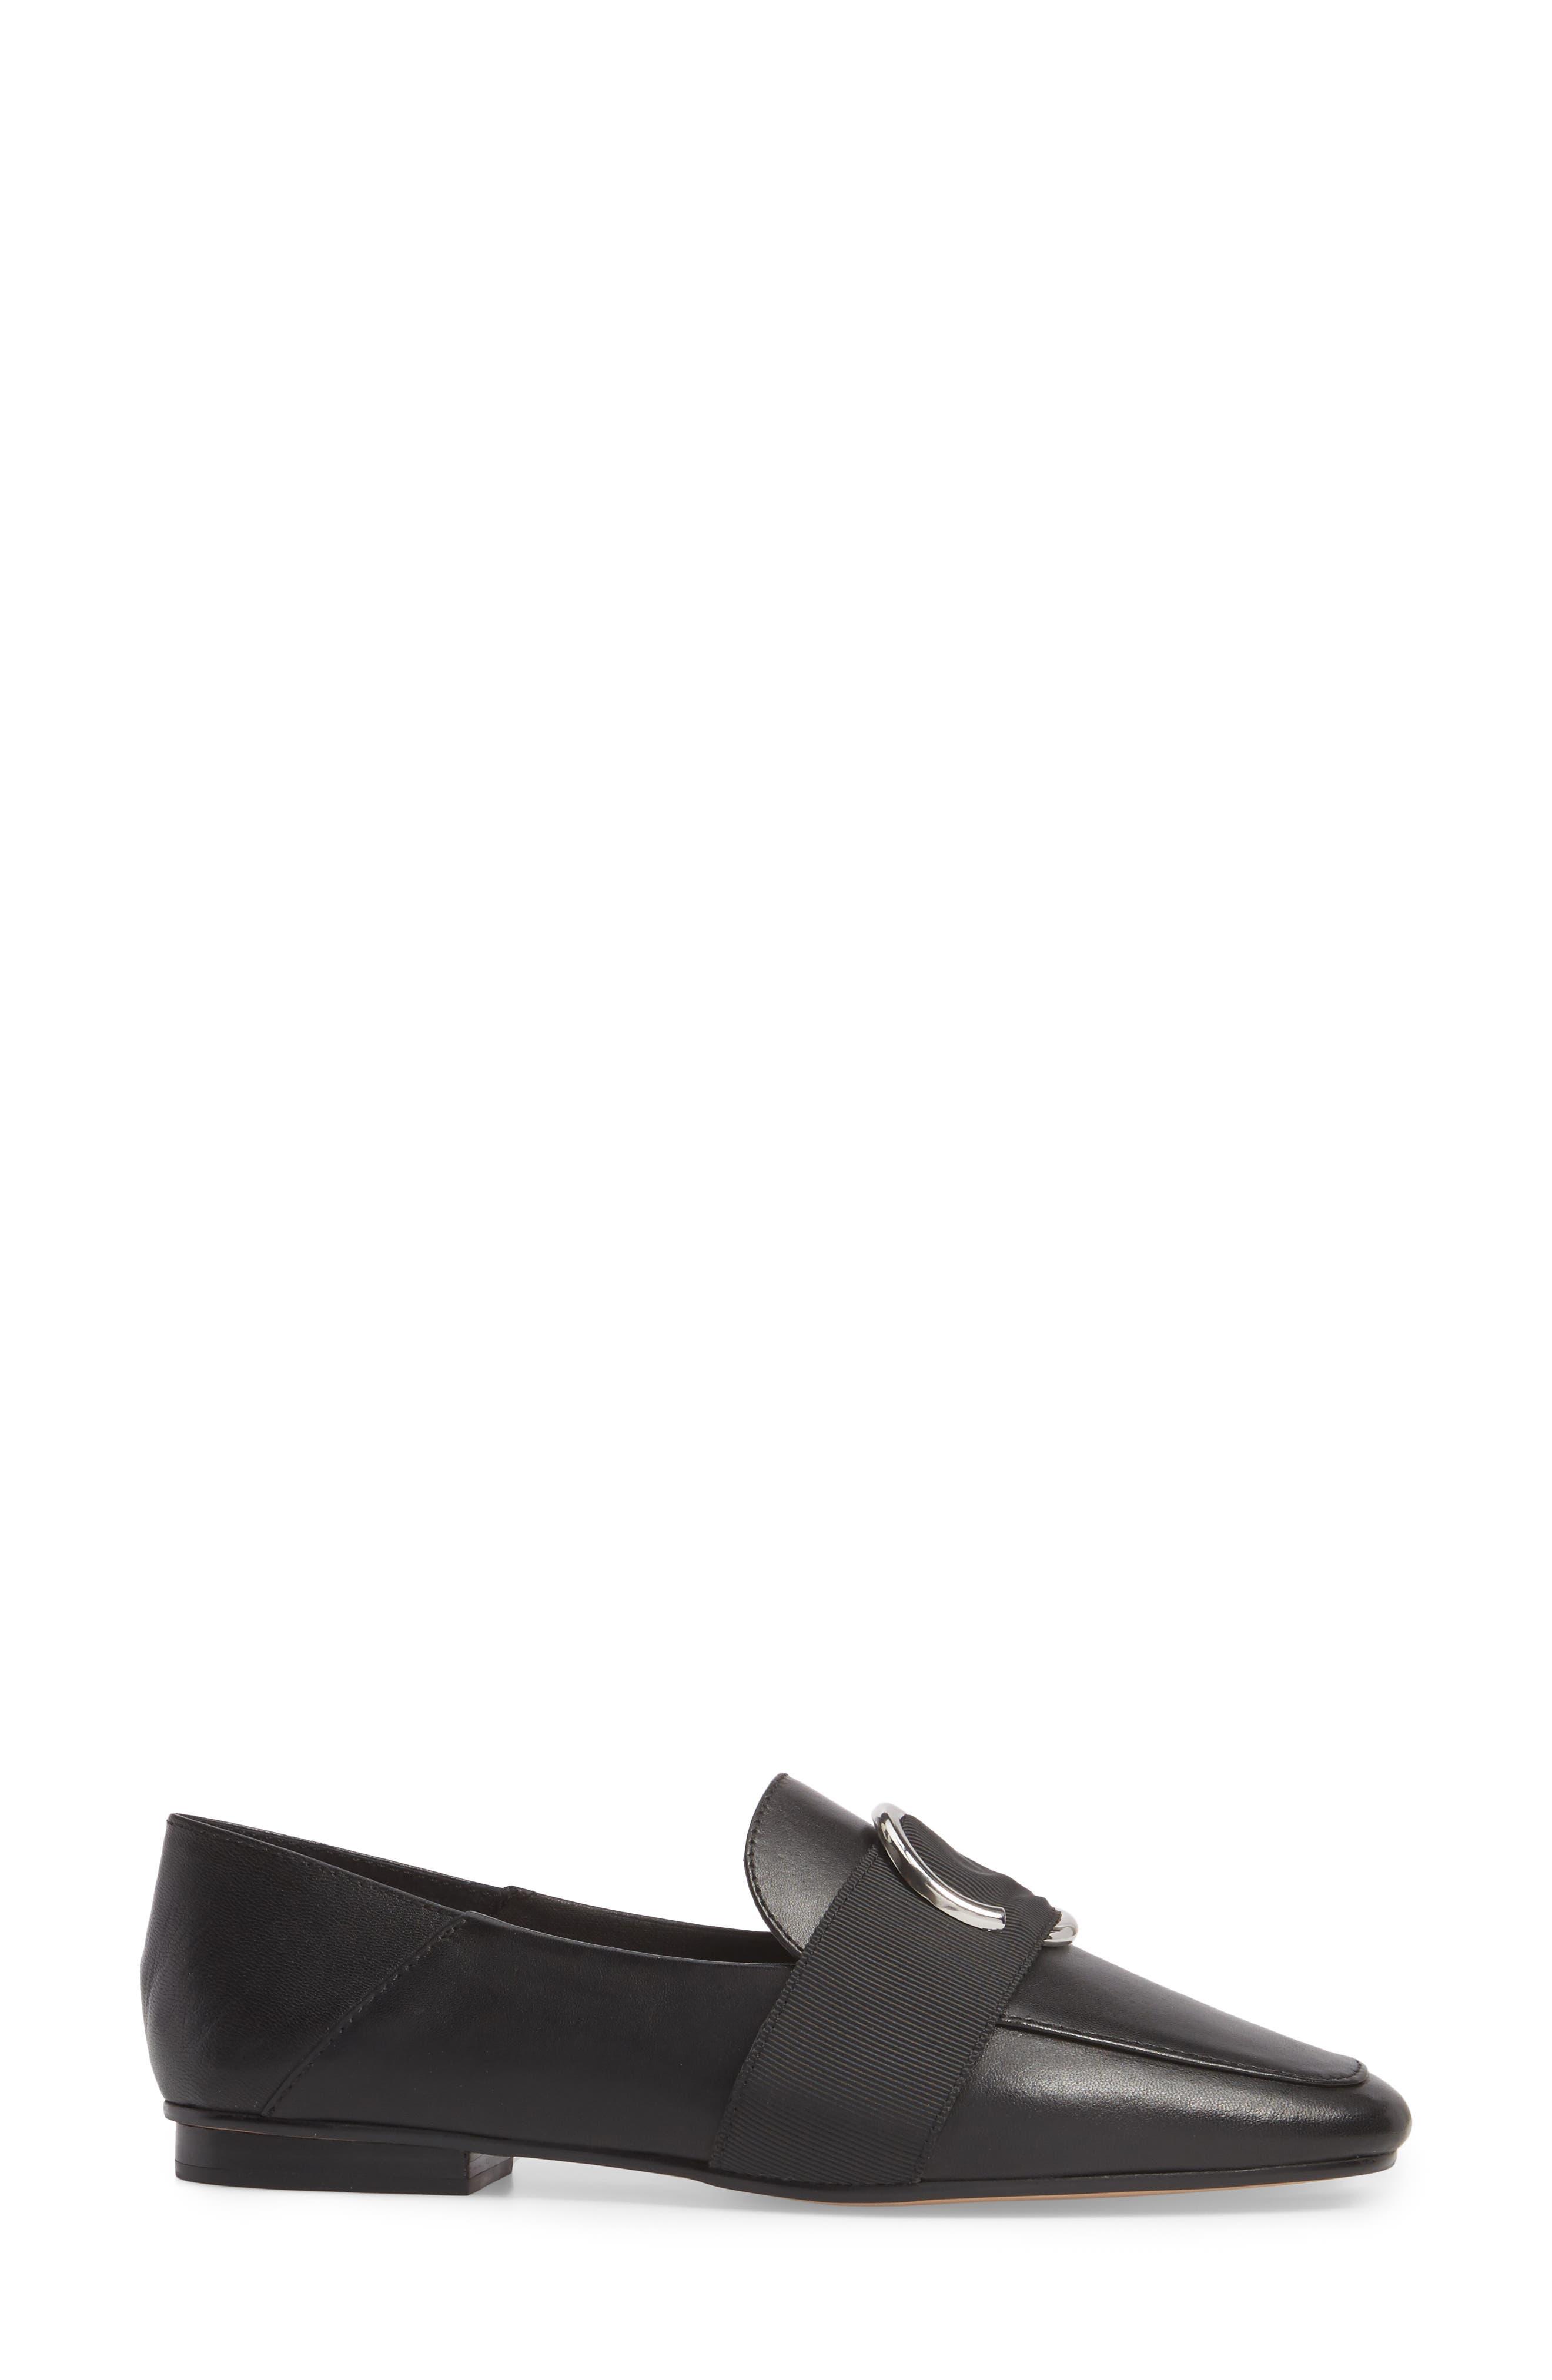 Ilani Convertible Slip Ring Loafer,                             Alternate thumbnail 3, color,                             001